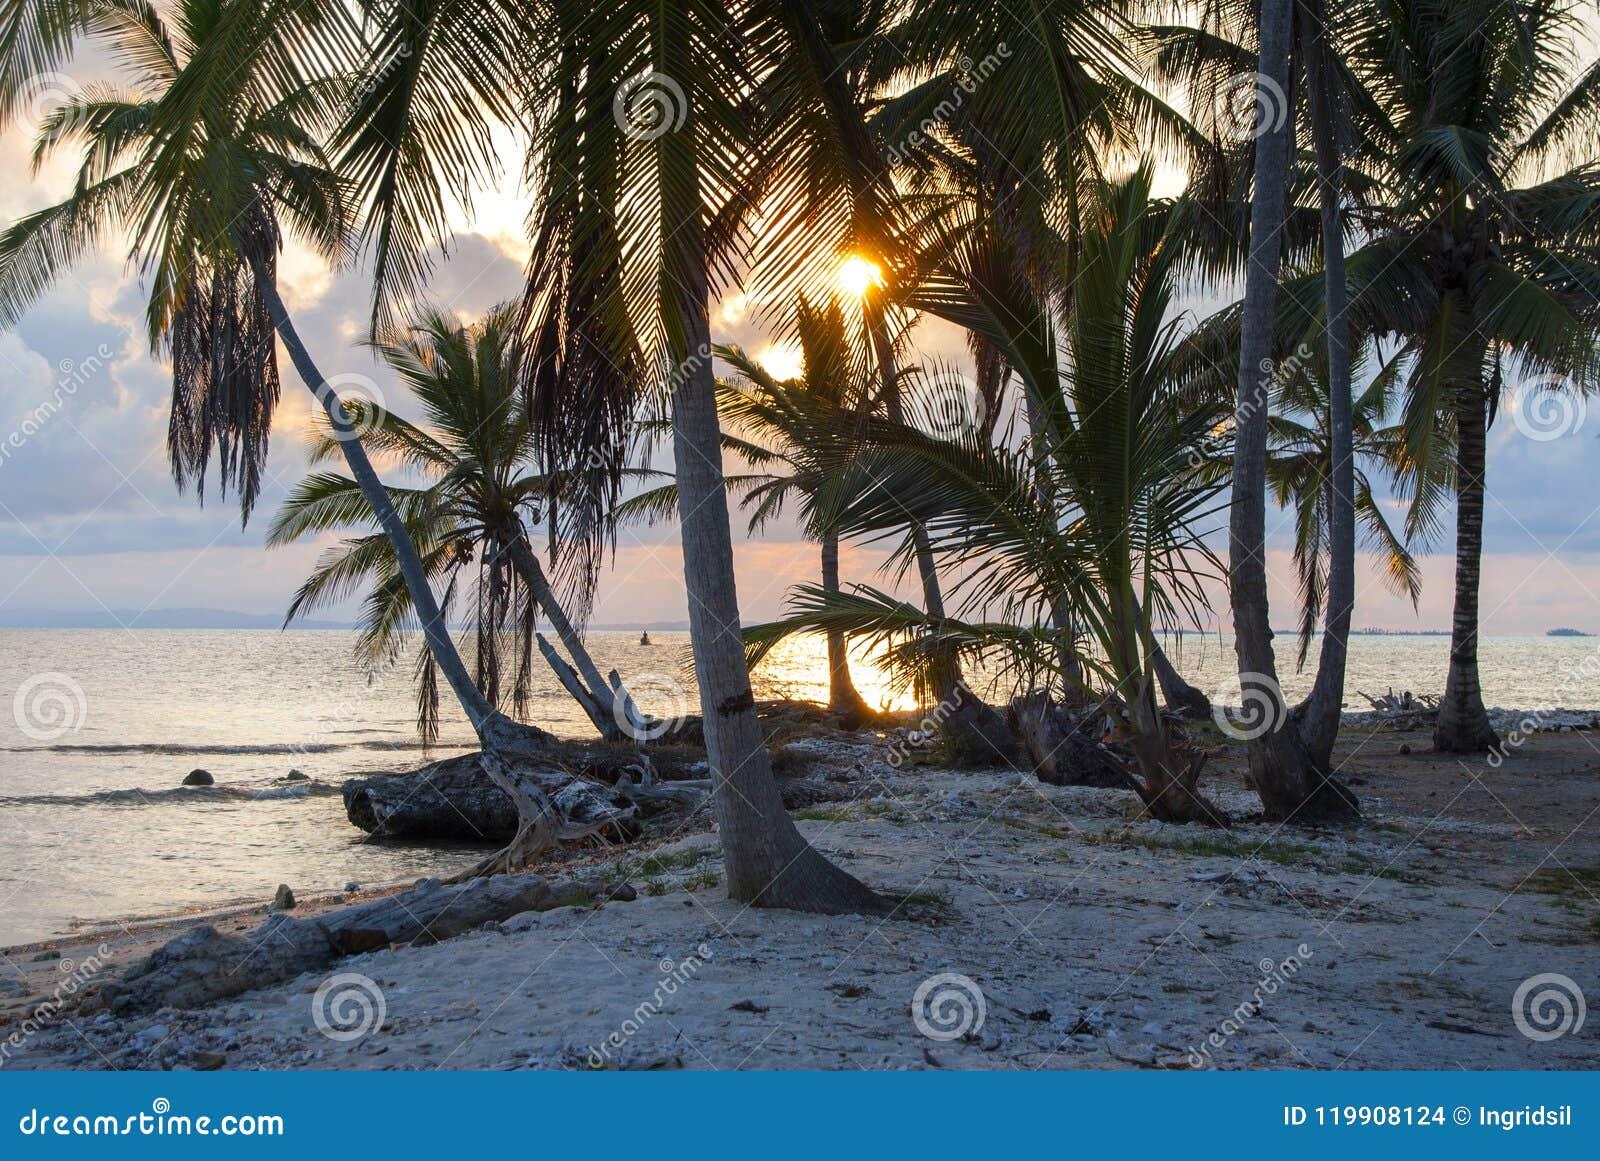 Paradies Sonnenuntergang SONNENAUFGANG